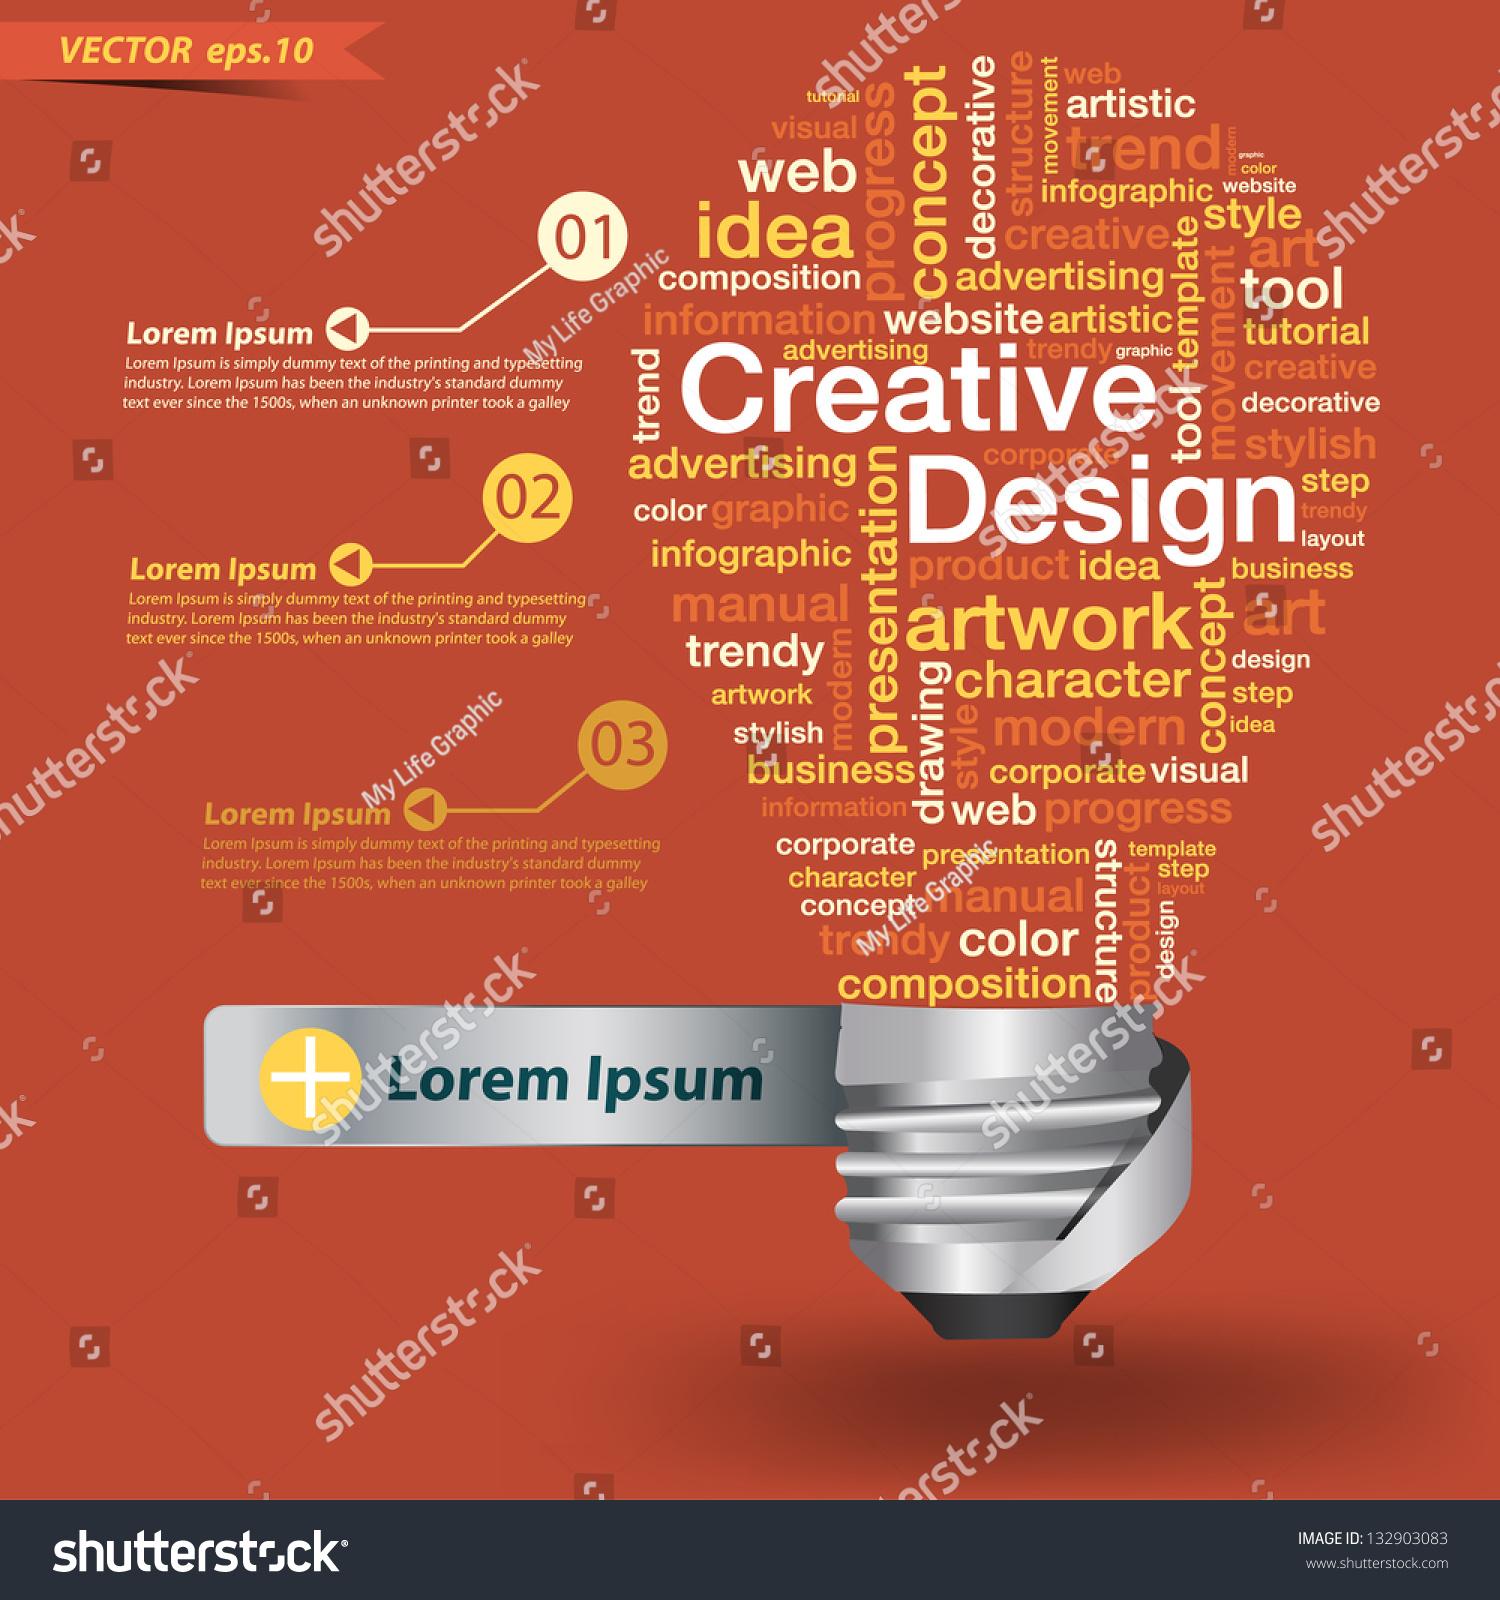 creative light bulb creative design concept stock vector  creative light bulb creative design concept of word cloud vector illustration modern template design